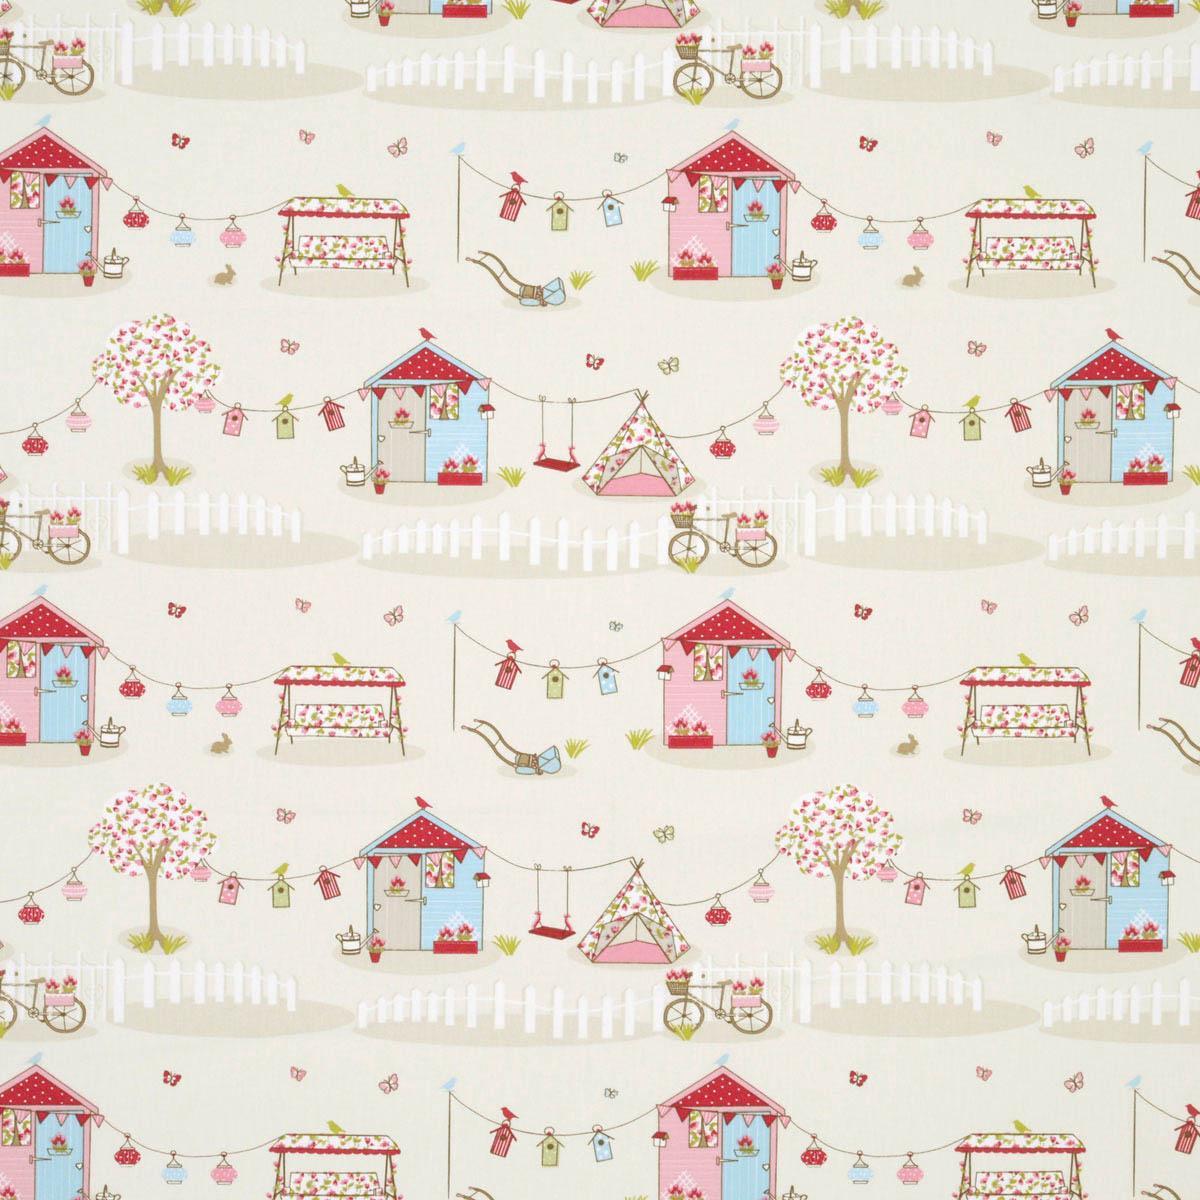 Candy Summer Holidays Curtain Fabric